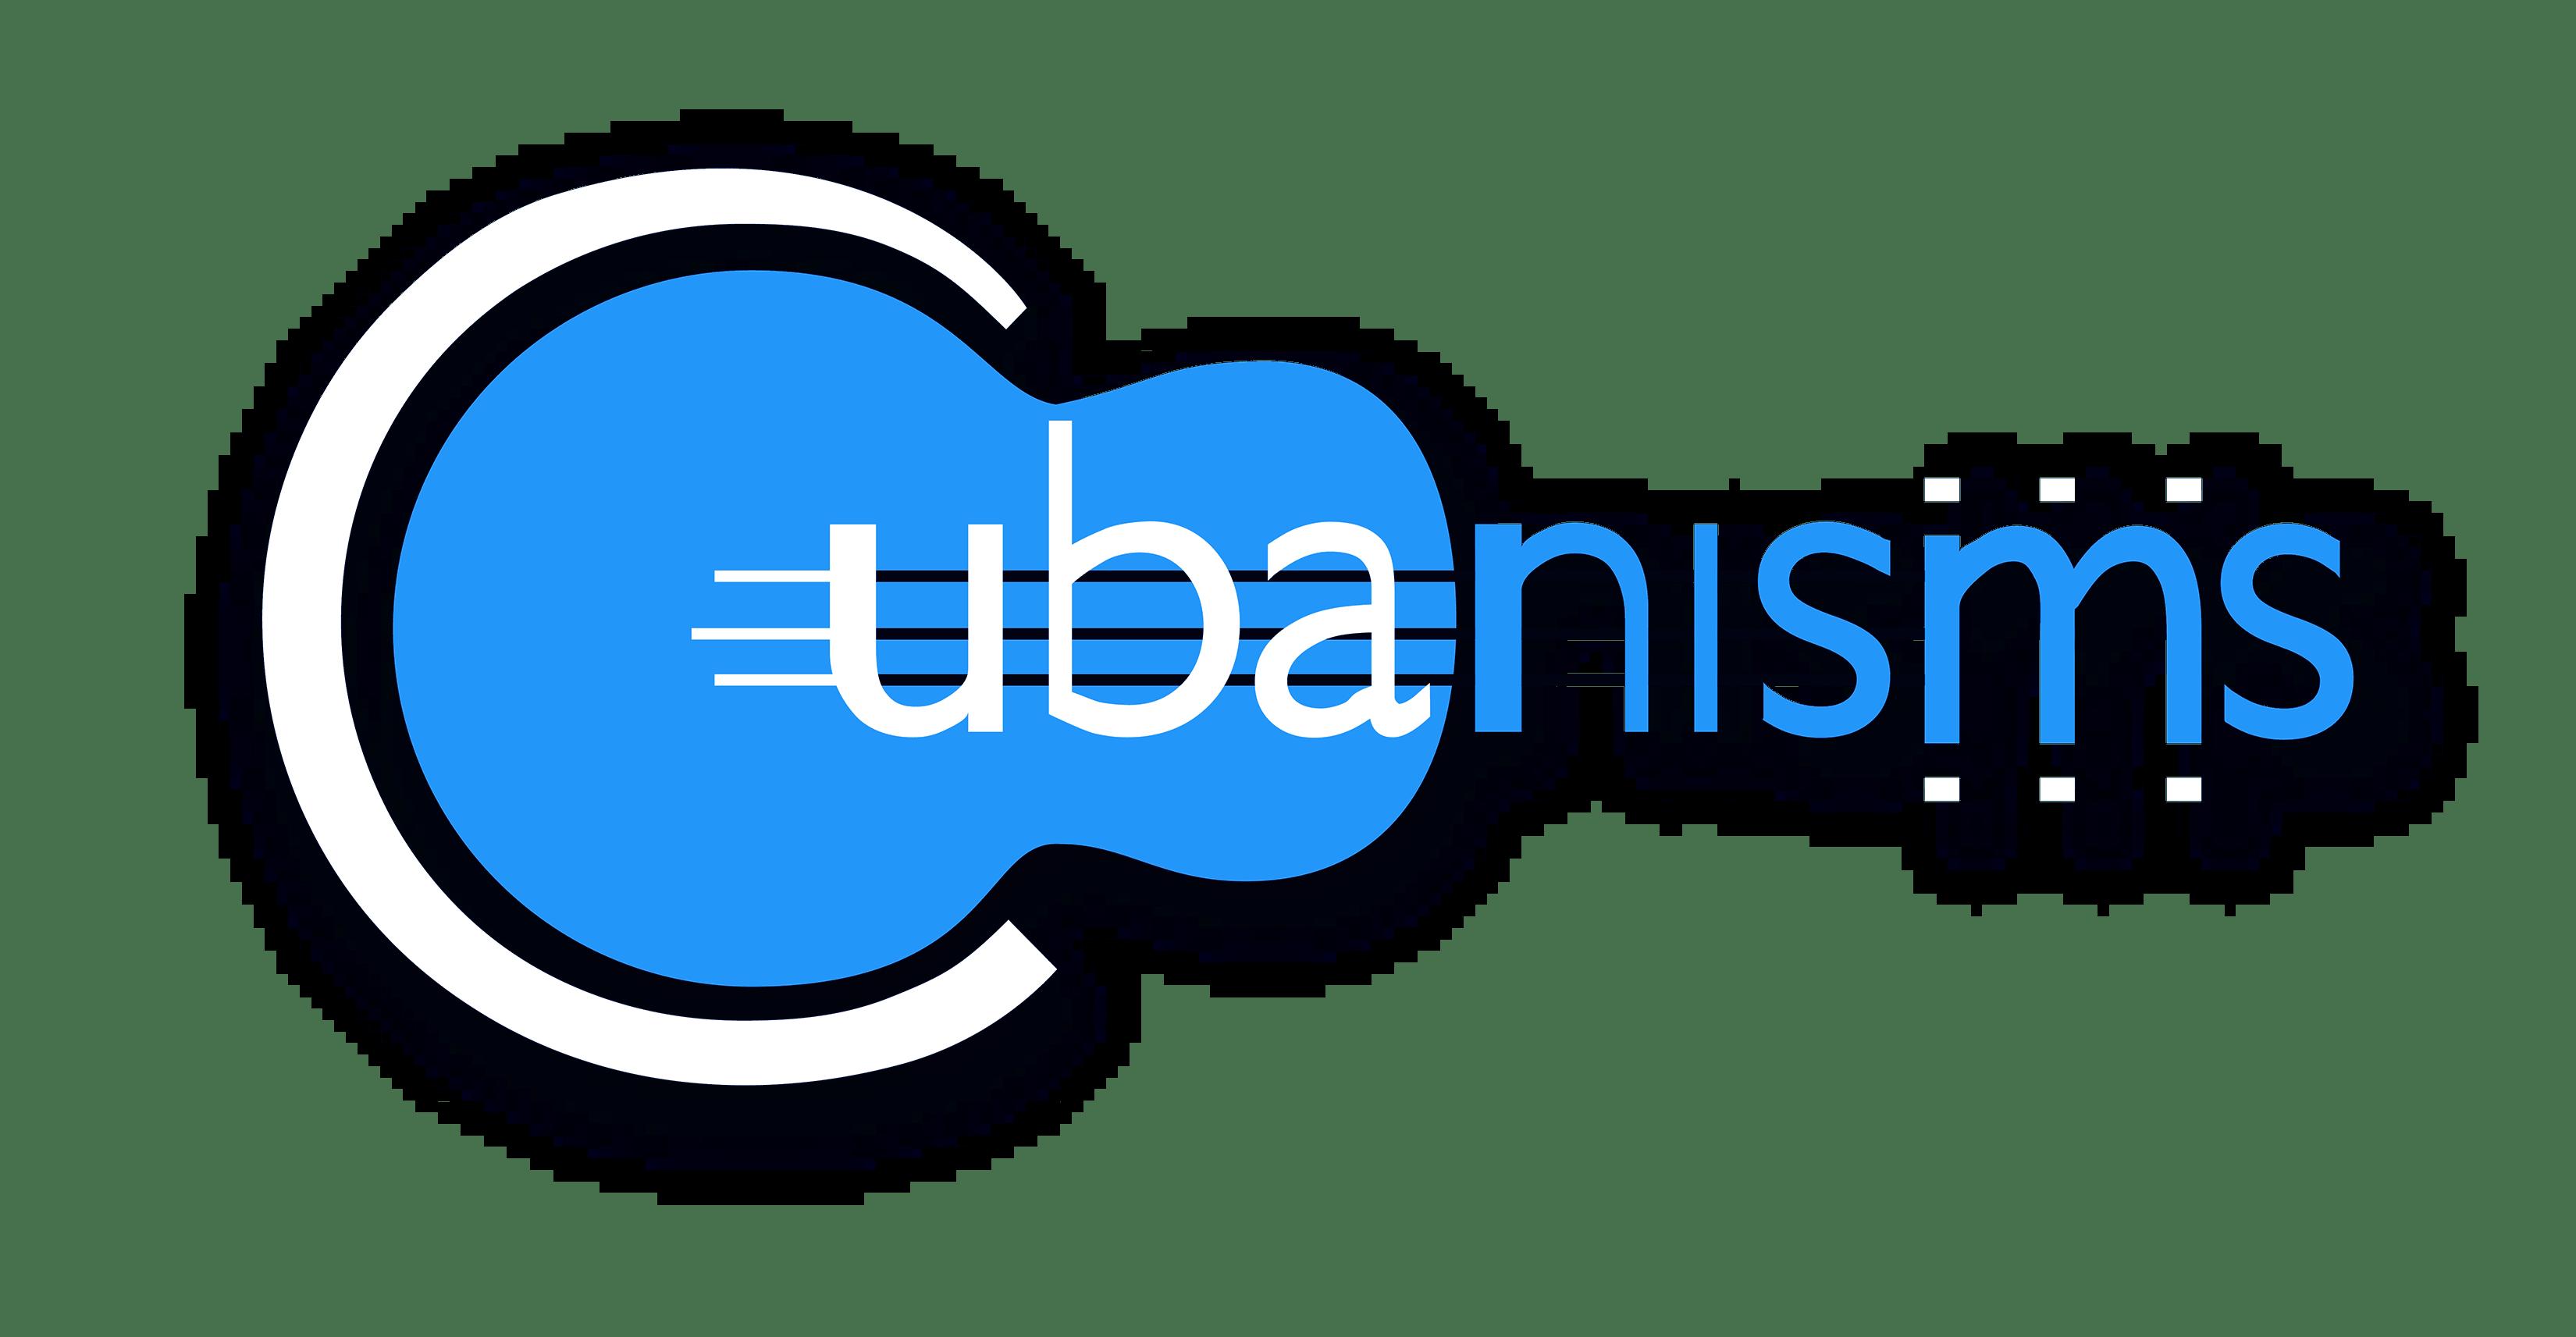 CUBANISMS : RECORD RELEASE